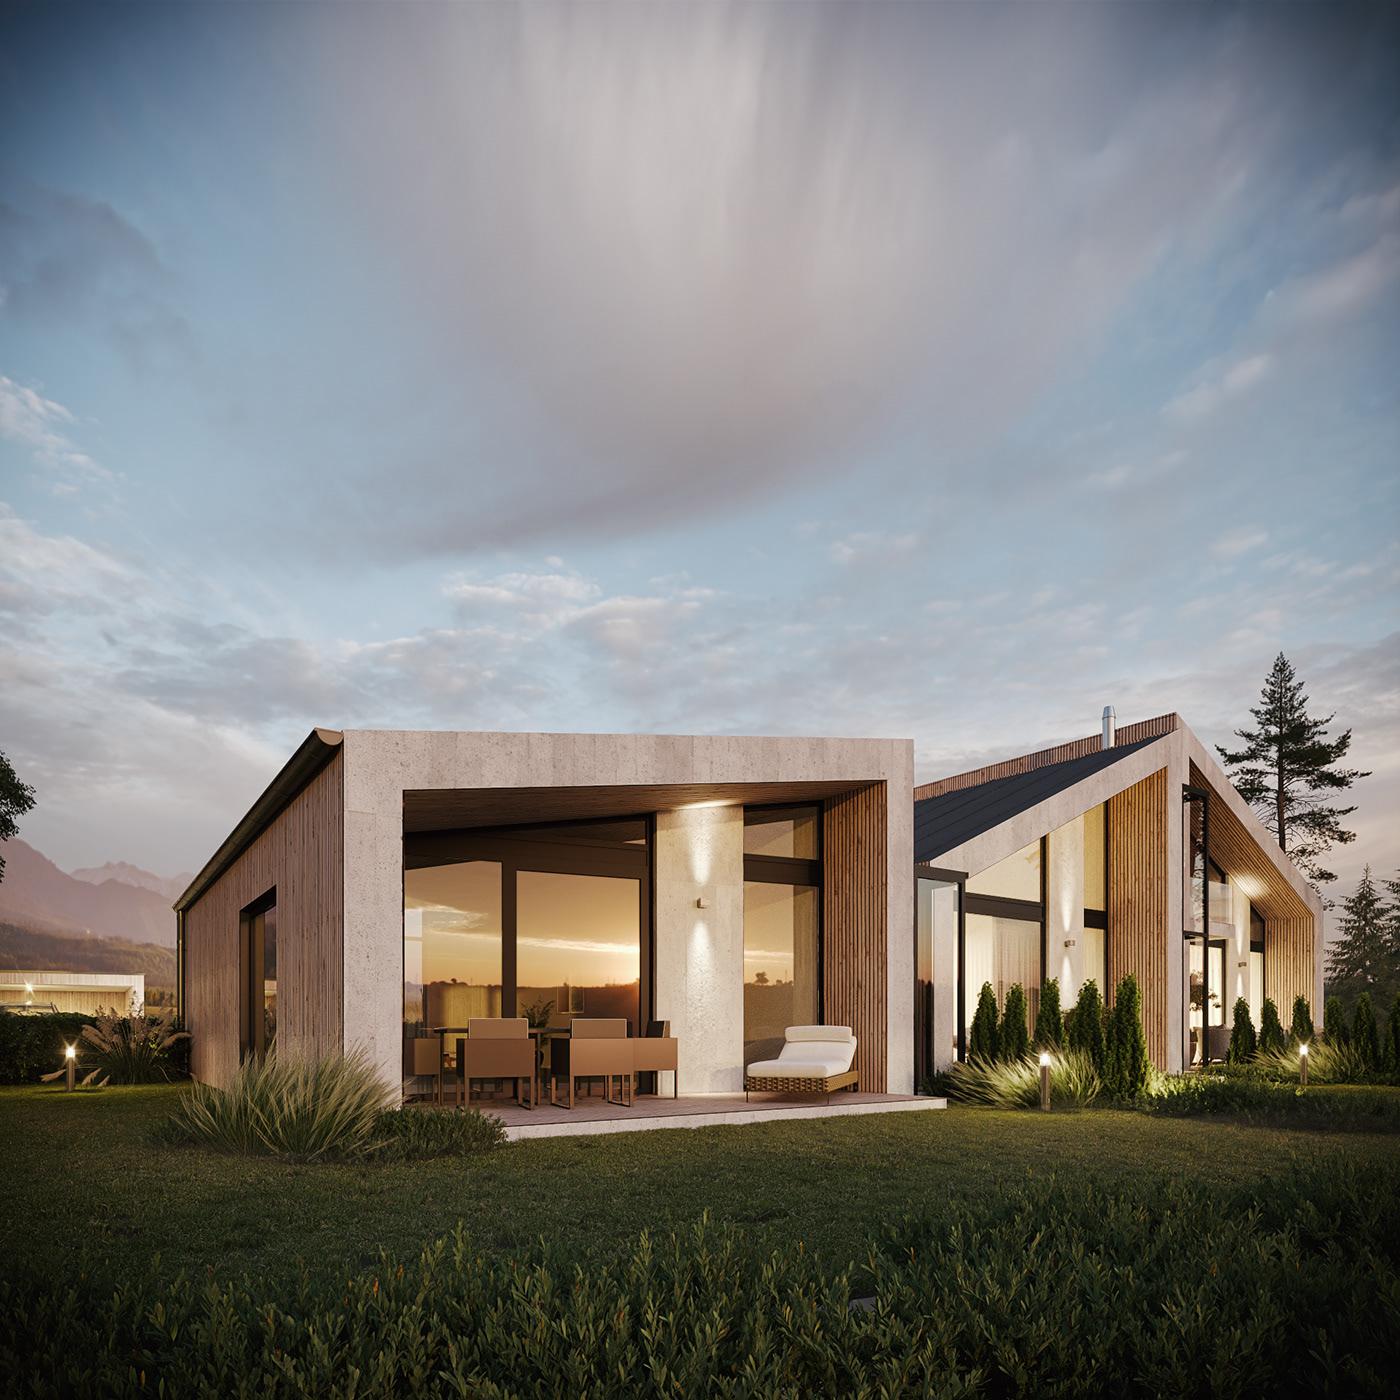 3dmax arch architecture CGI CoronaRender  design Render revit visualization viz